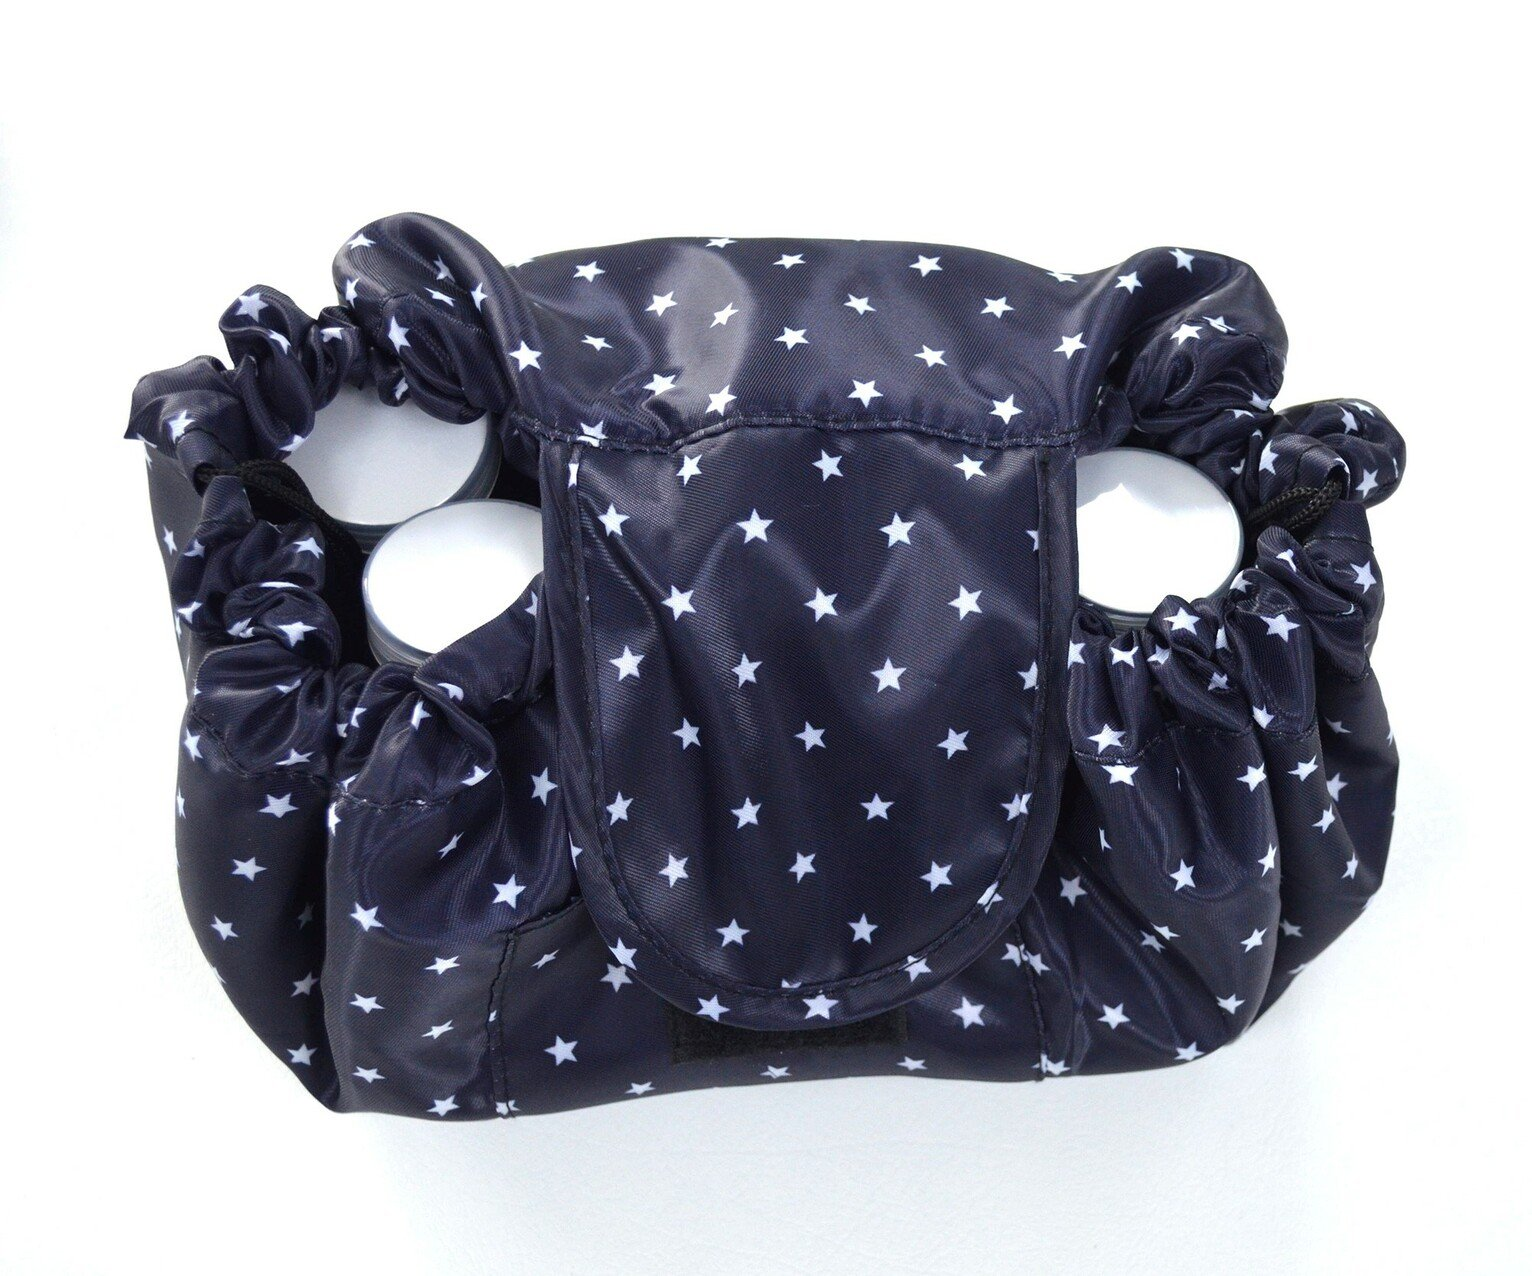 Maven Drawstring Star Make-Up Bag